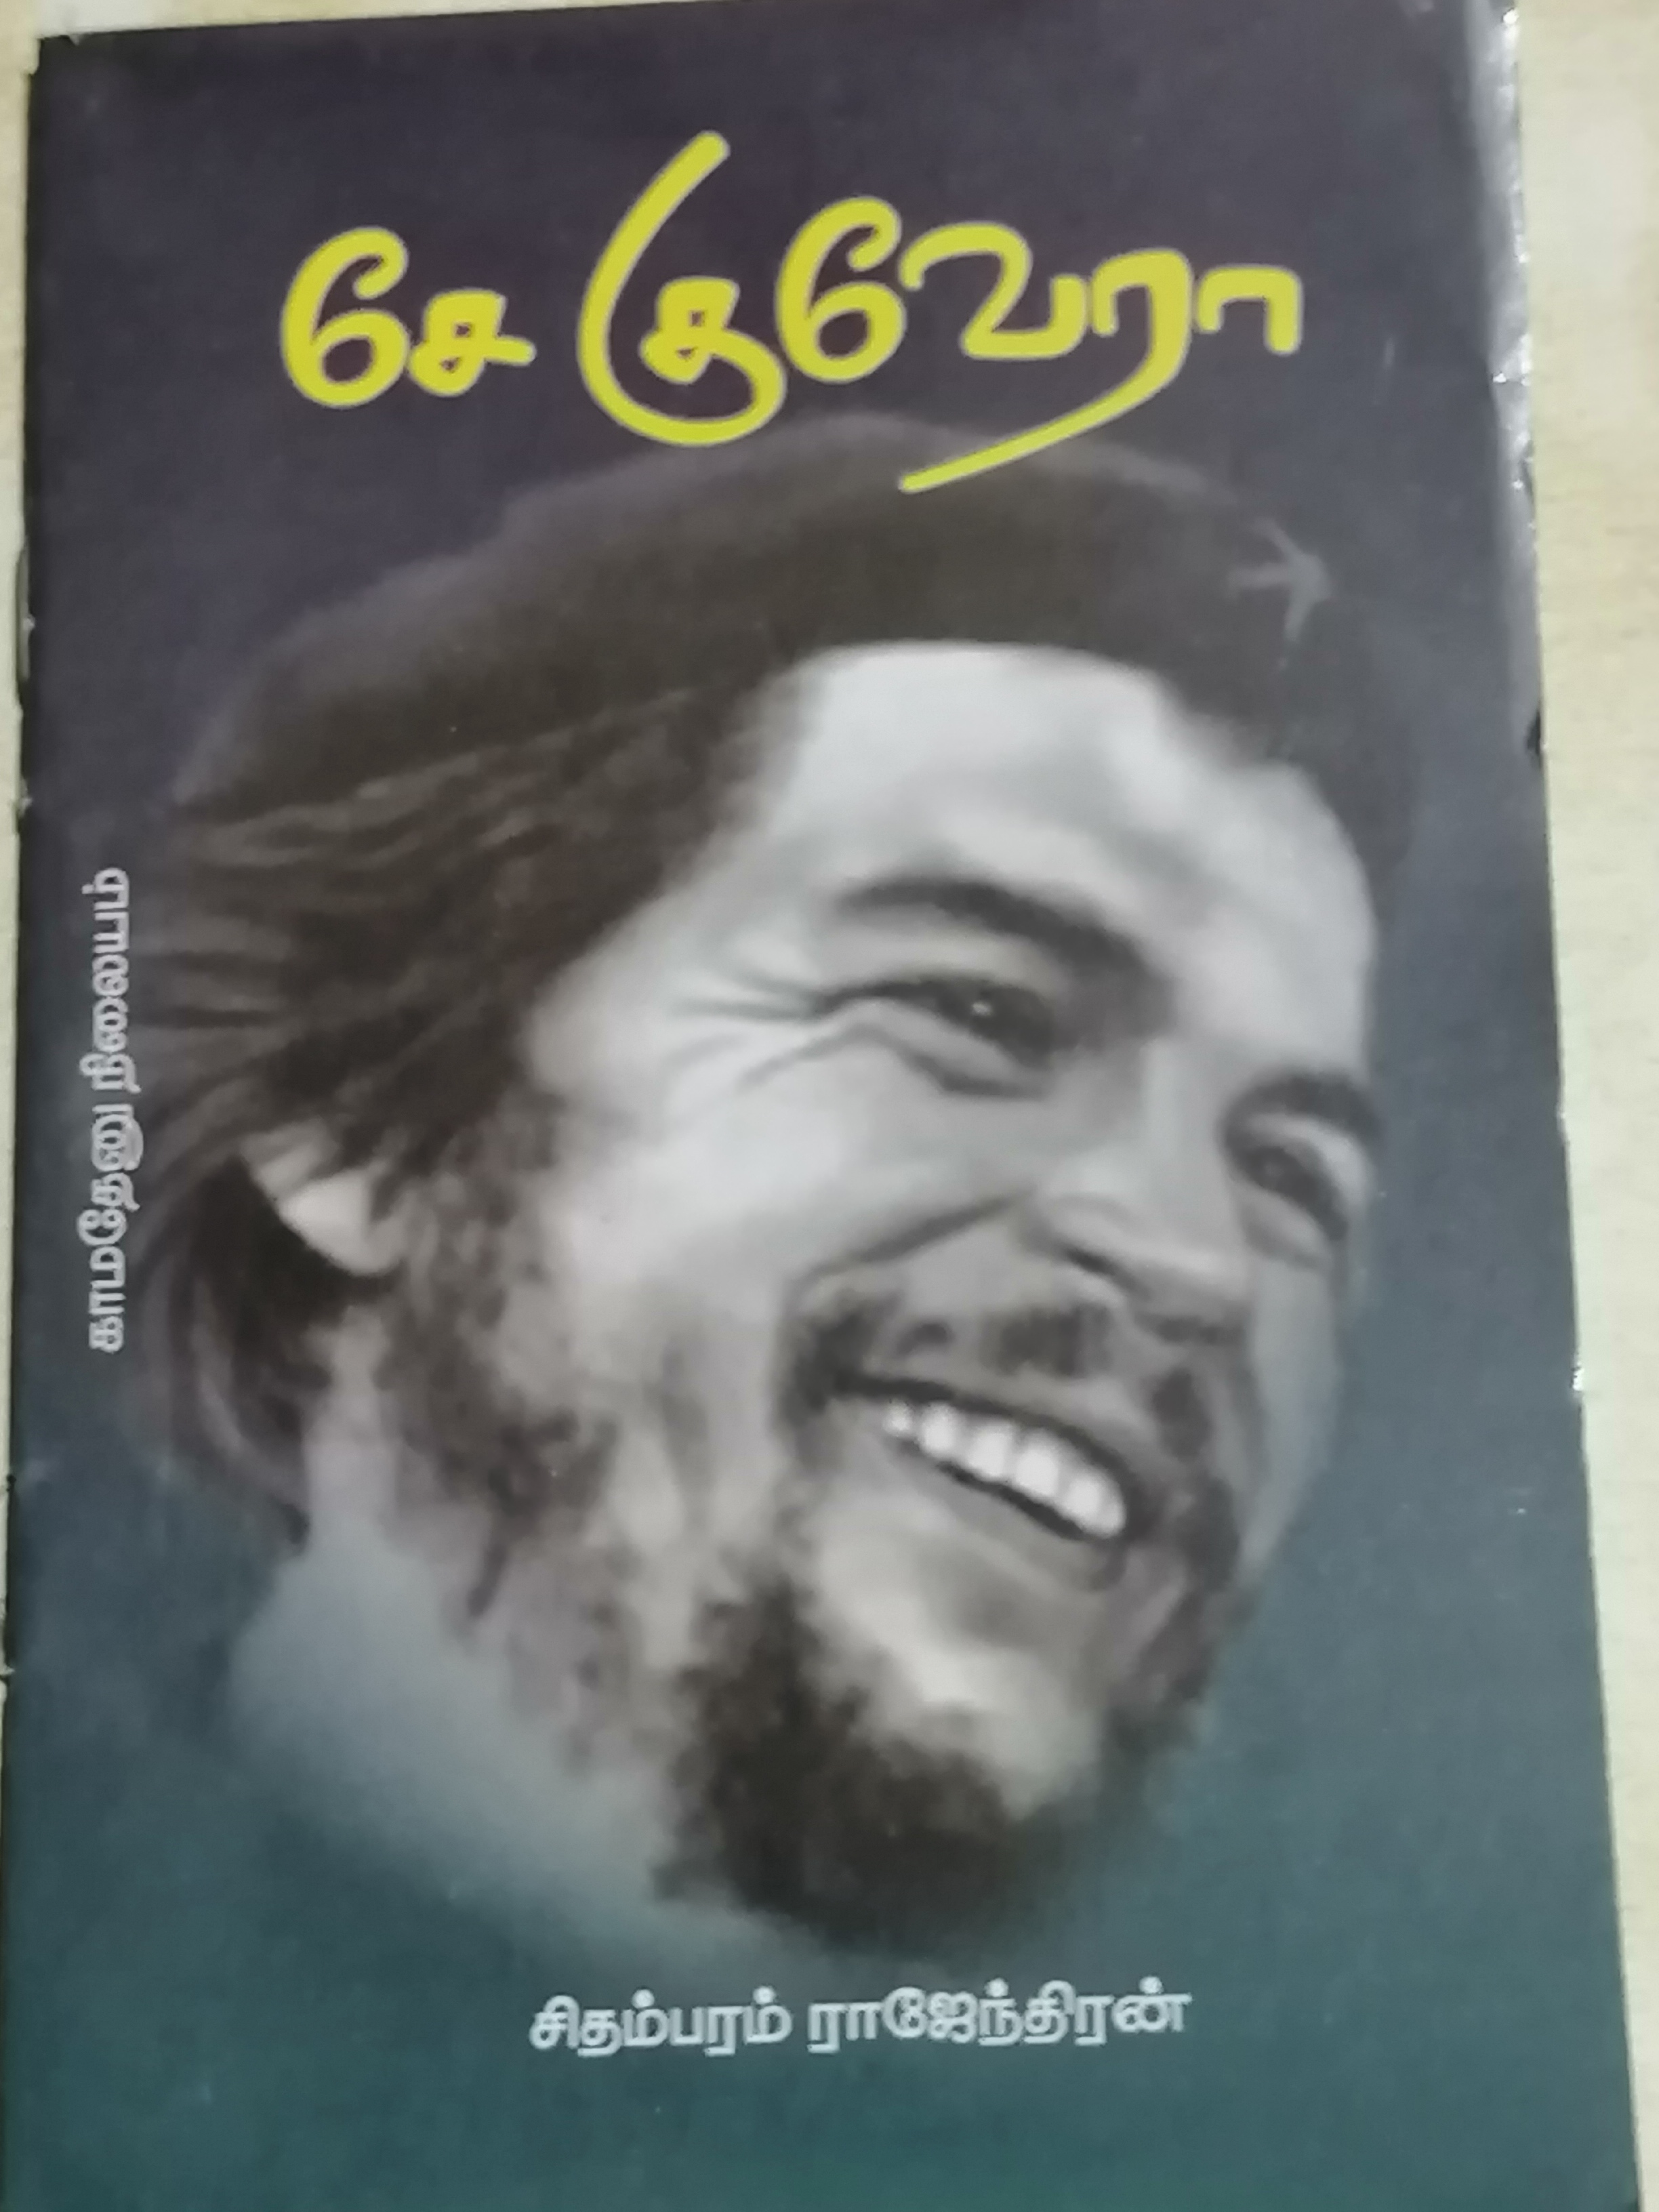 Che Guevara by Chidambaram Rajendiran சே குவேரா - சிதம்பரம் ராஜேந்திரன்